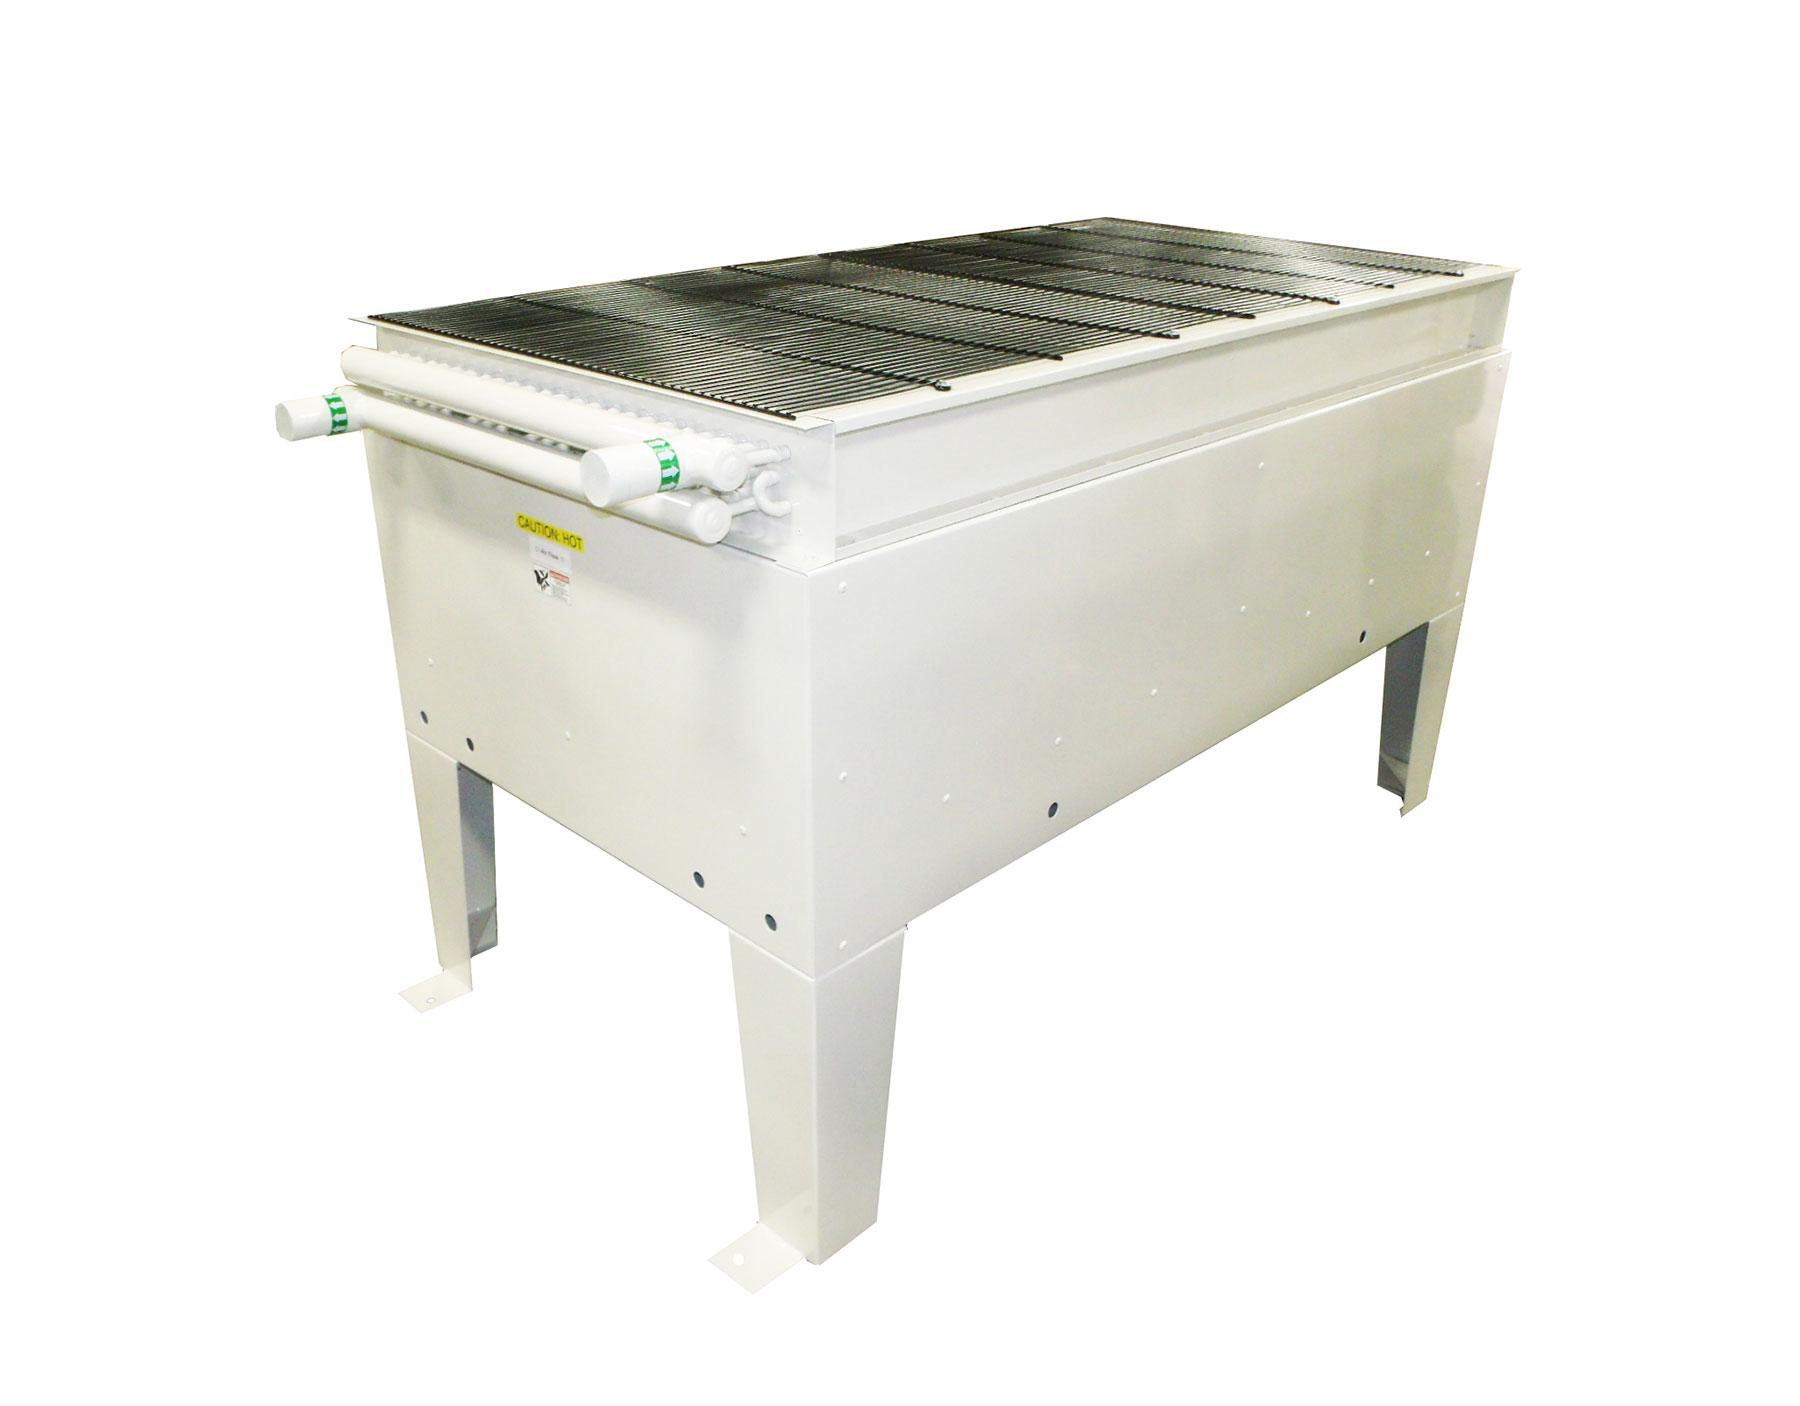 AquaVent AVF Air-Cooled Heat Exchanger